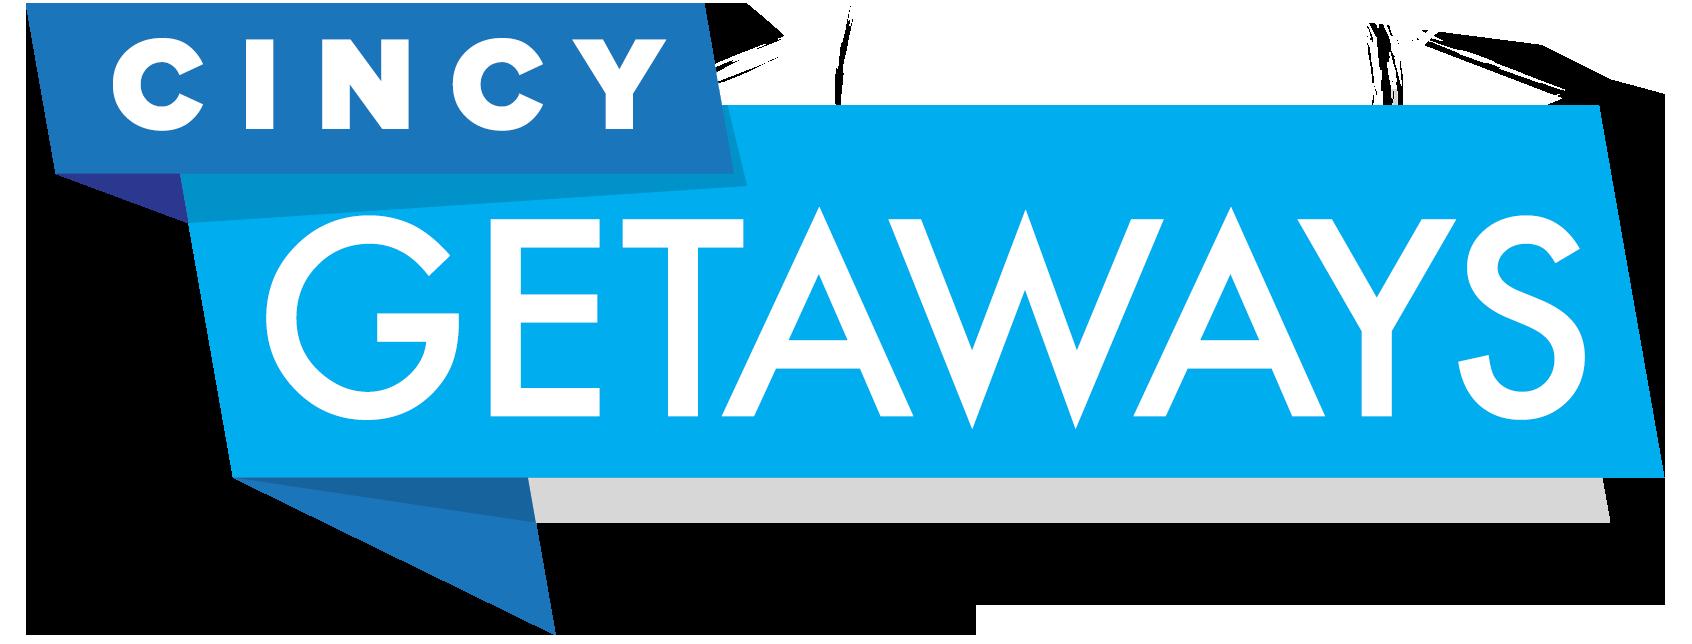 Cincy Getaways